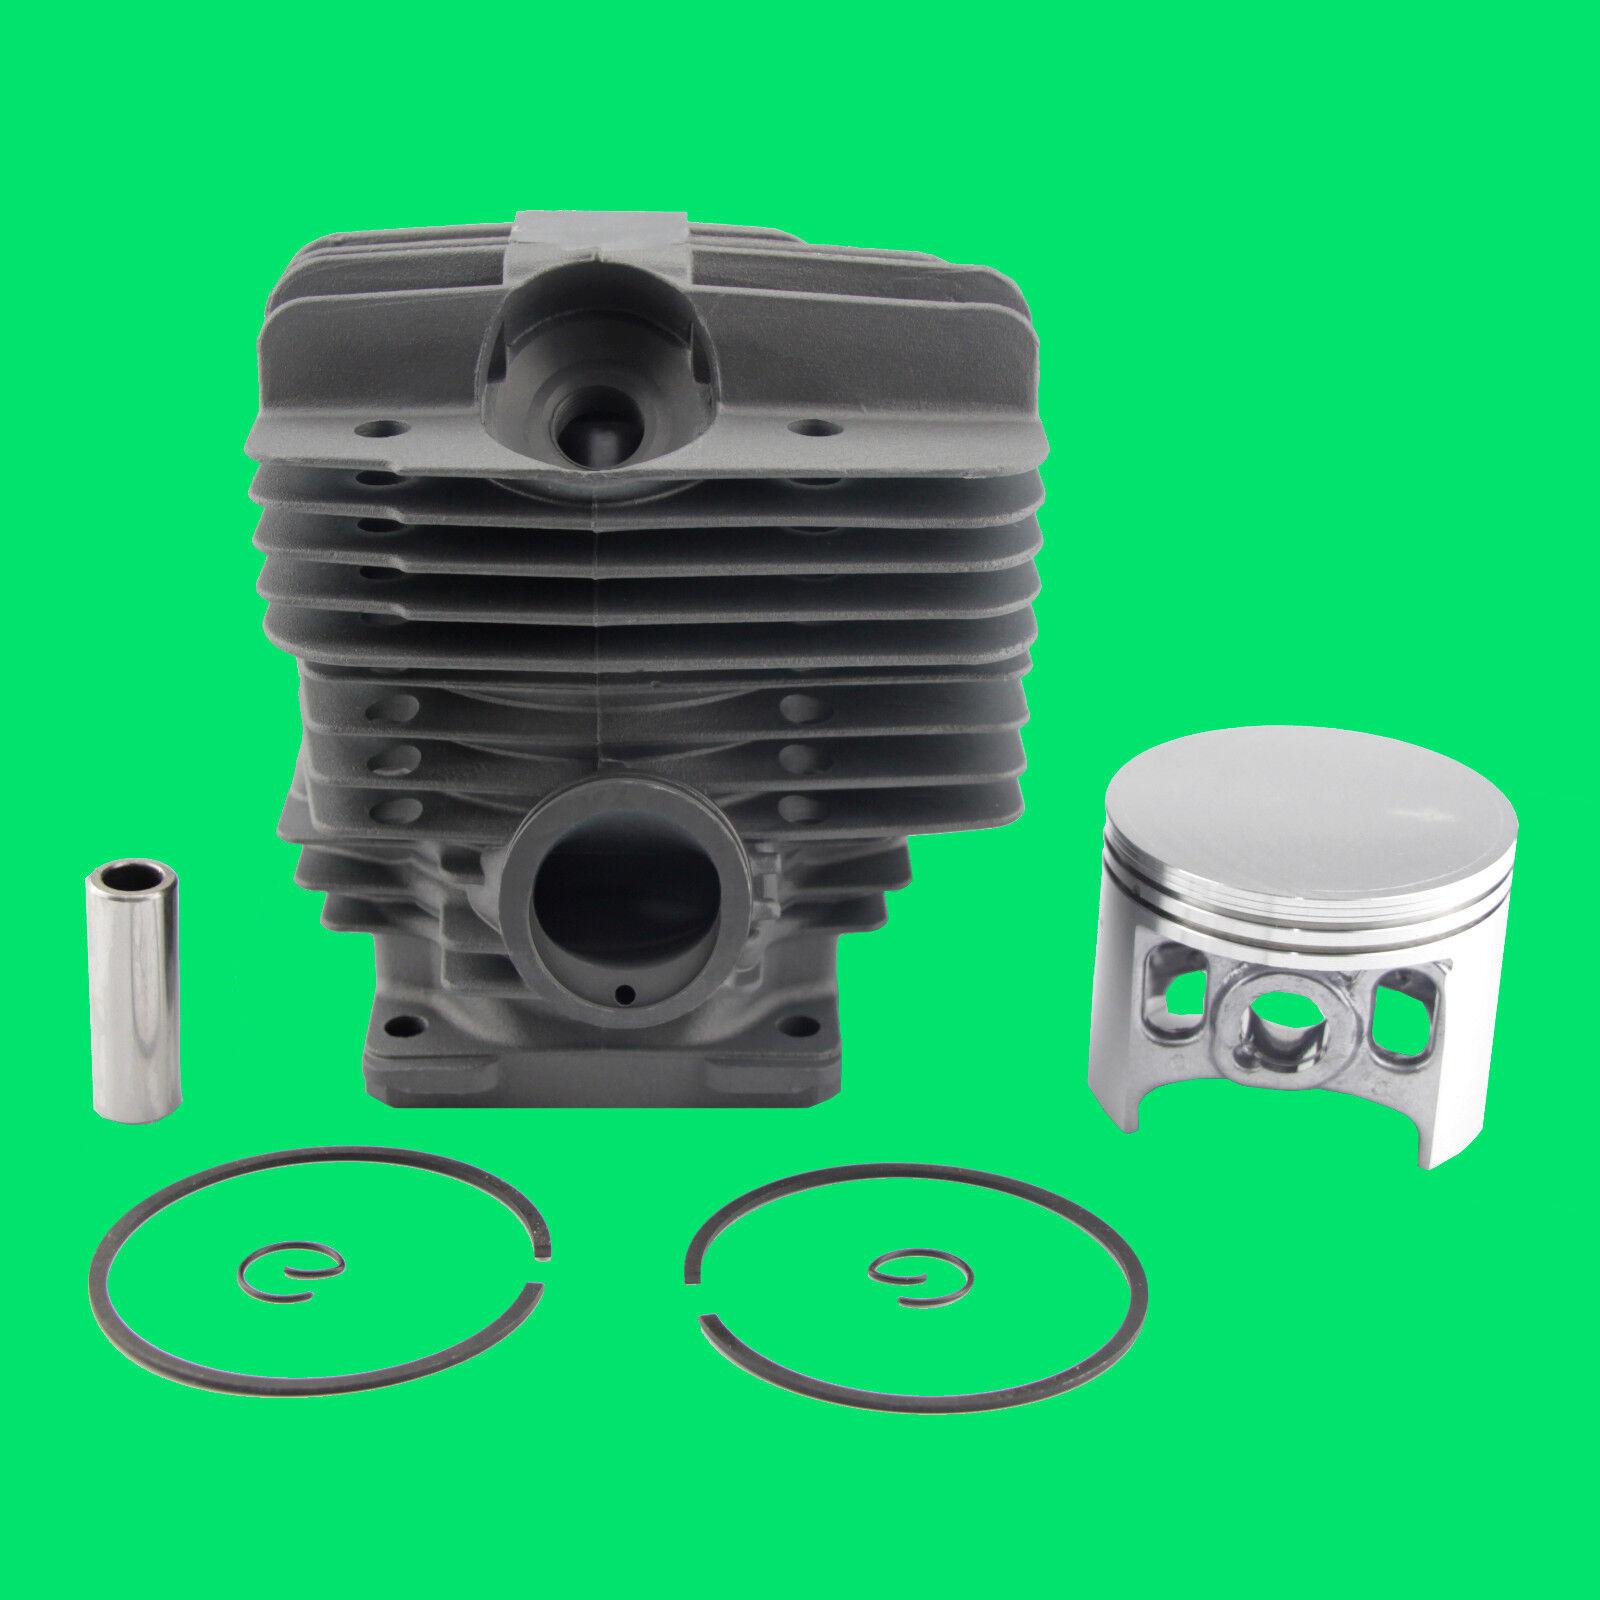 60mm cilindro del pasador del pistón anillo para Stihl MS880 088 Motosierra Rep Original Equipment Manufacturer 1124 020 1209